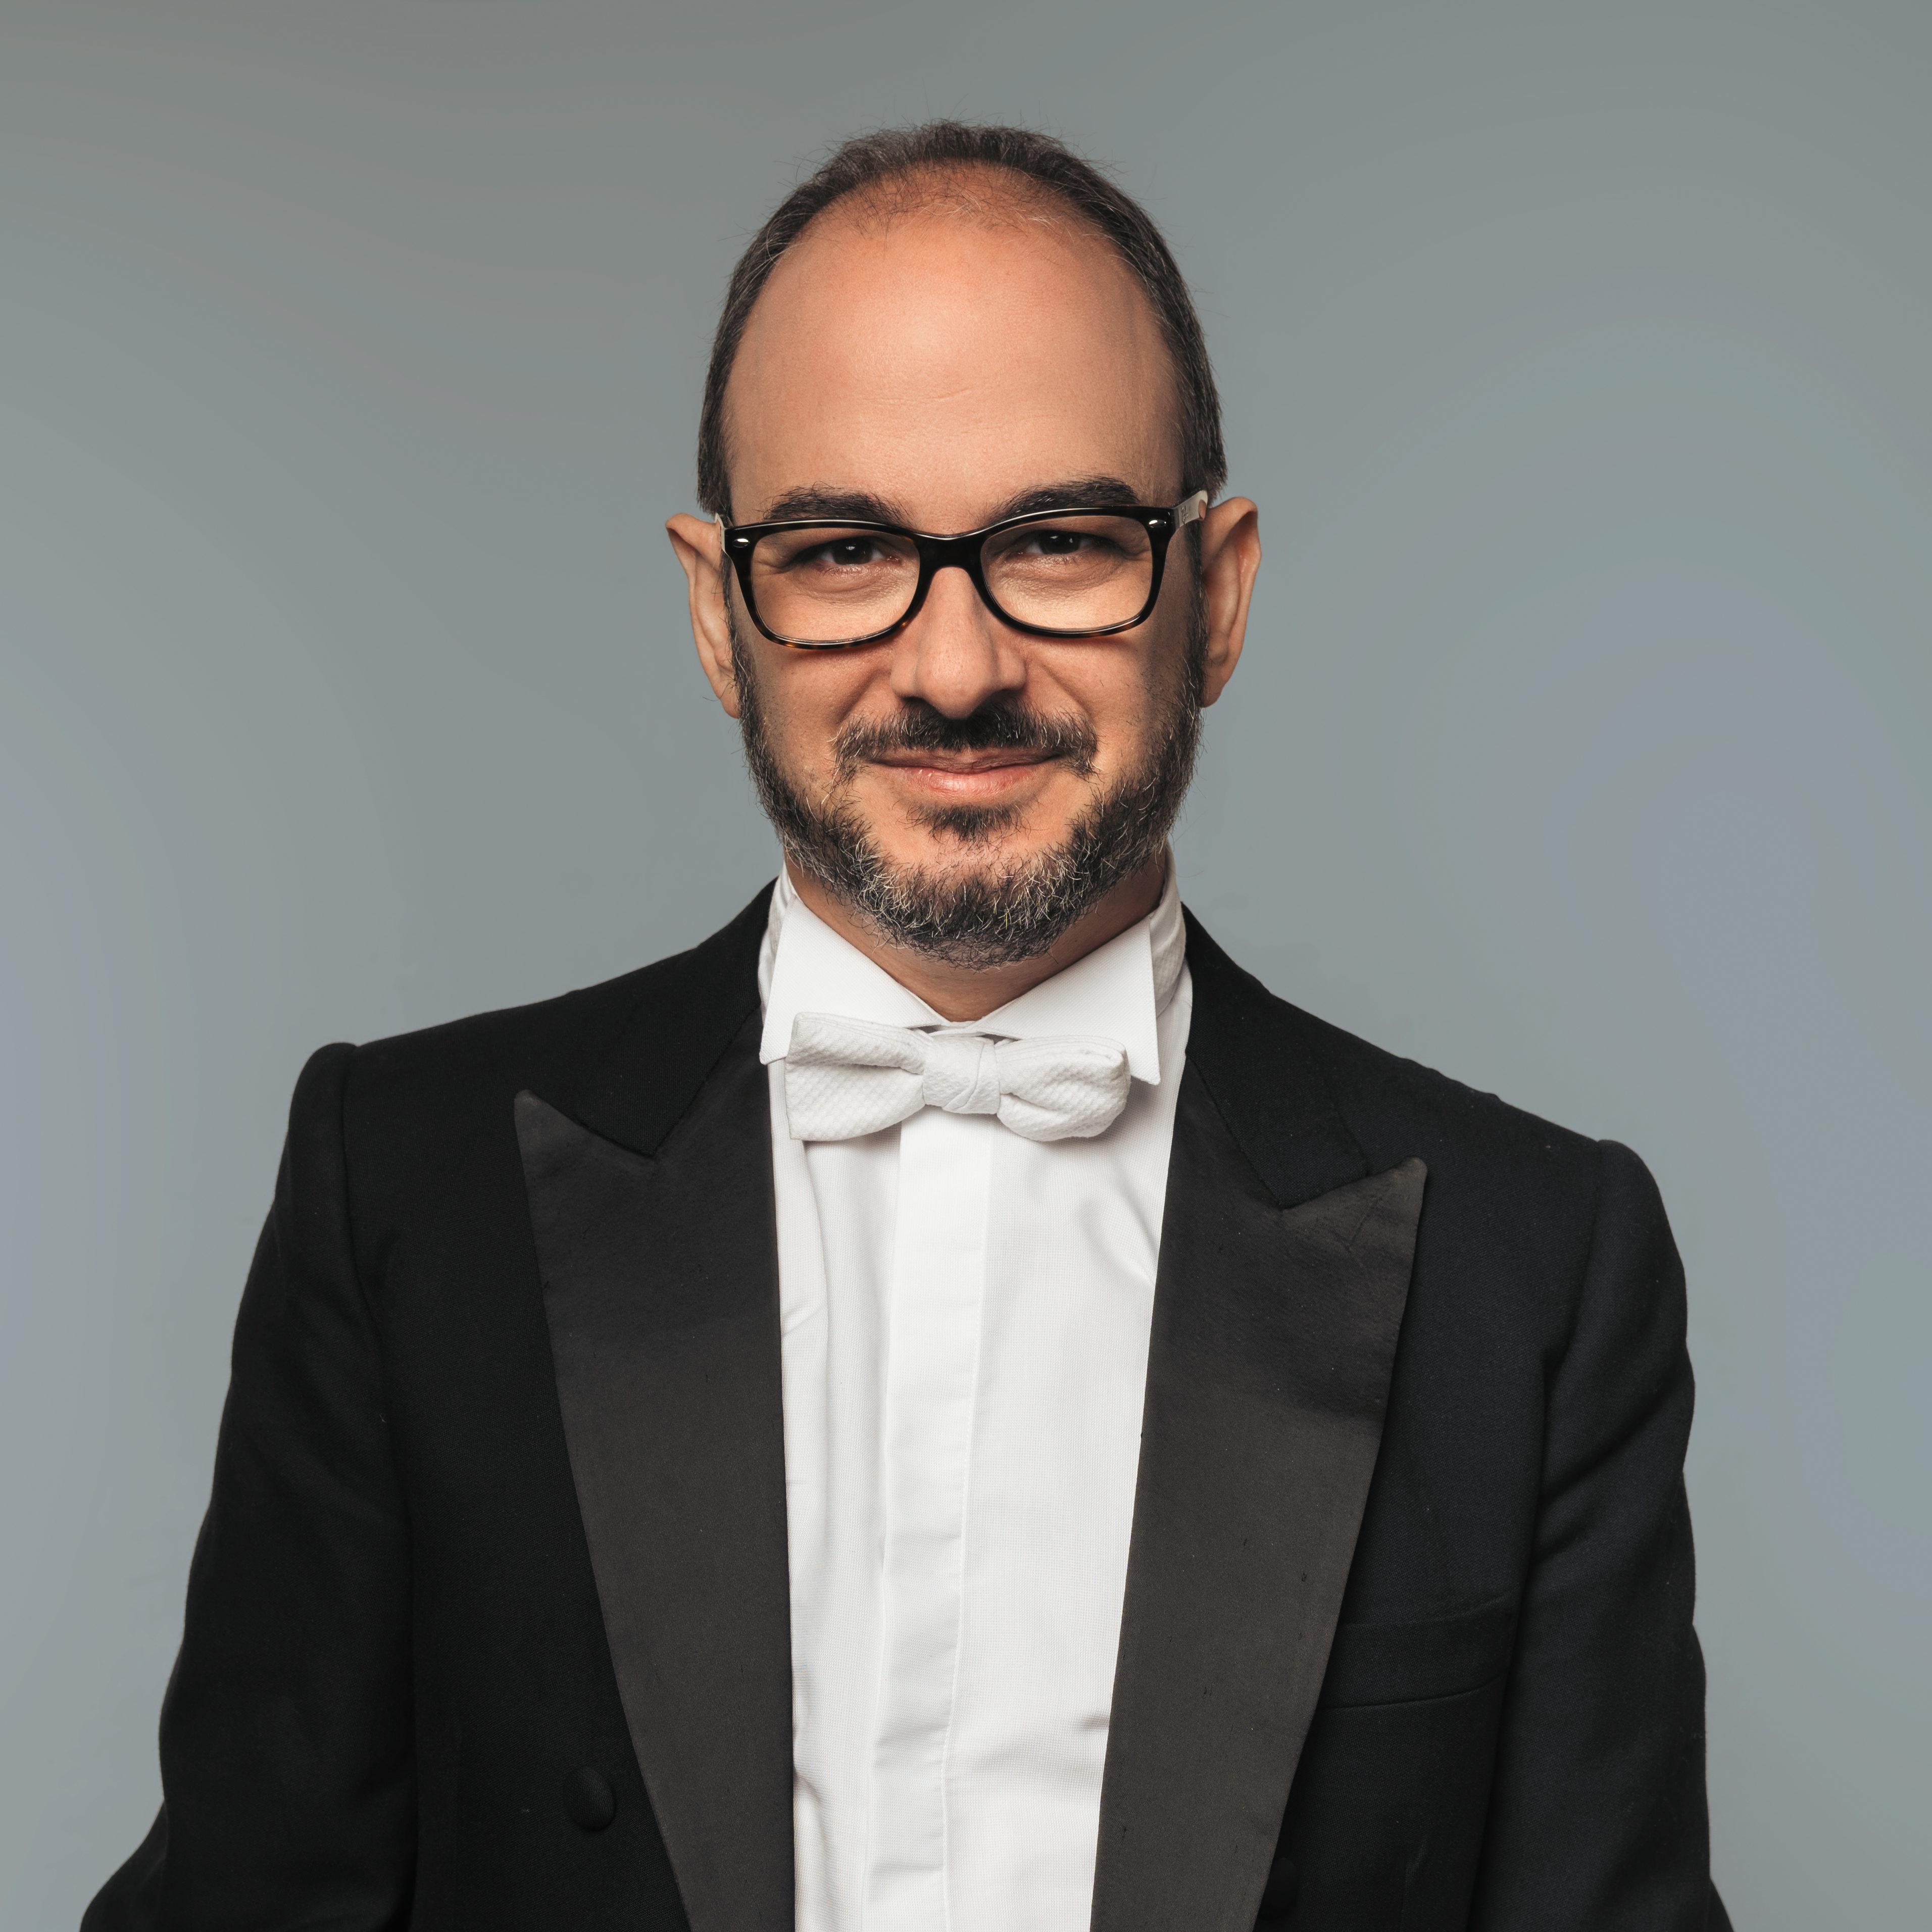 Salvador Barberá